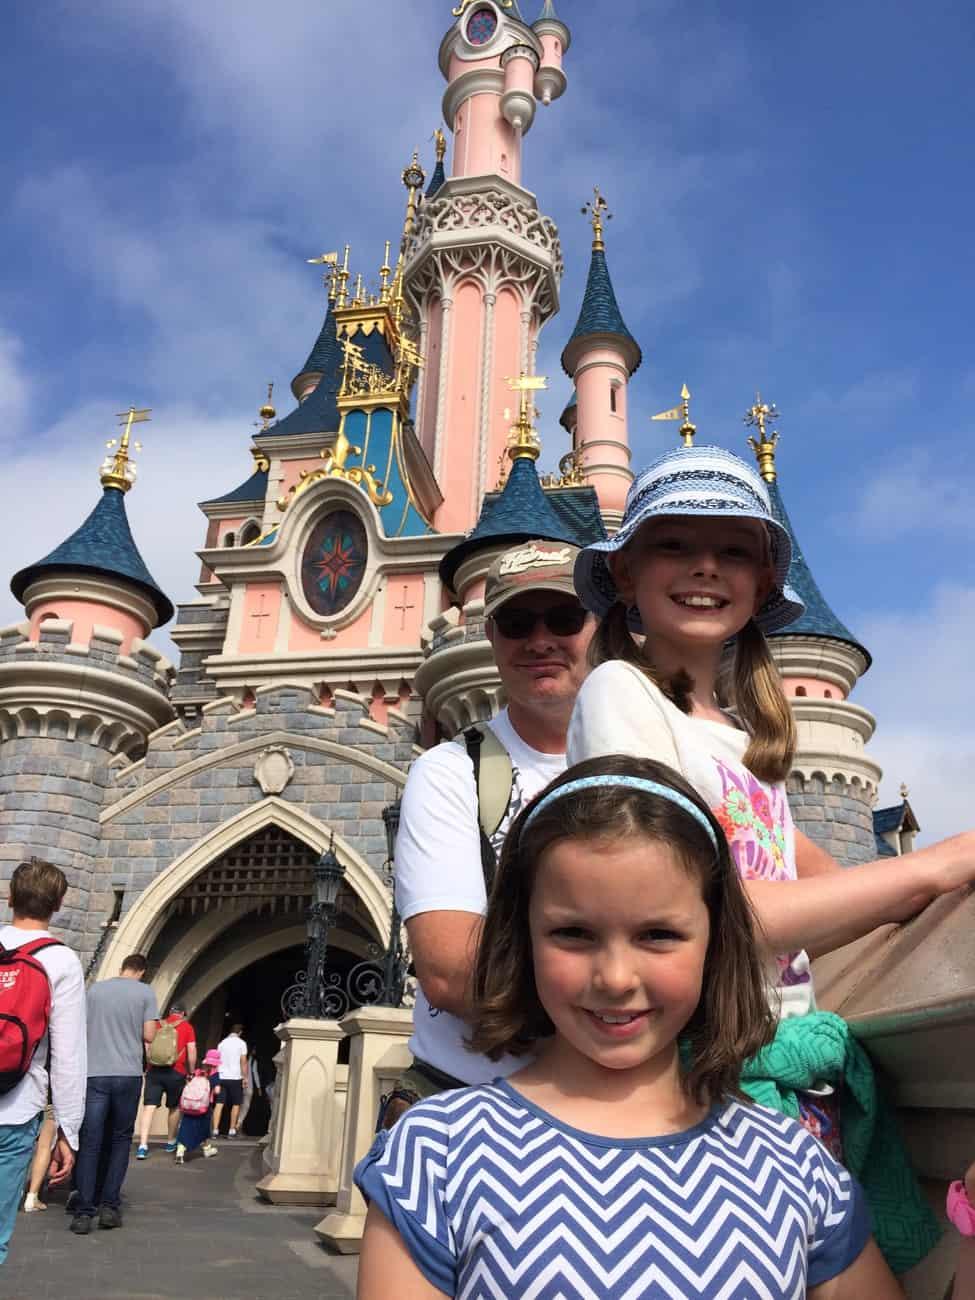 Disney - Princess Castle